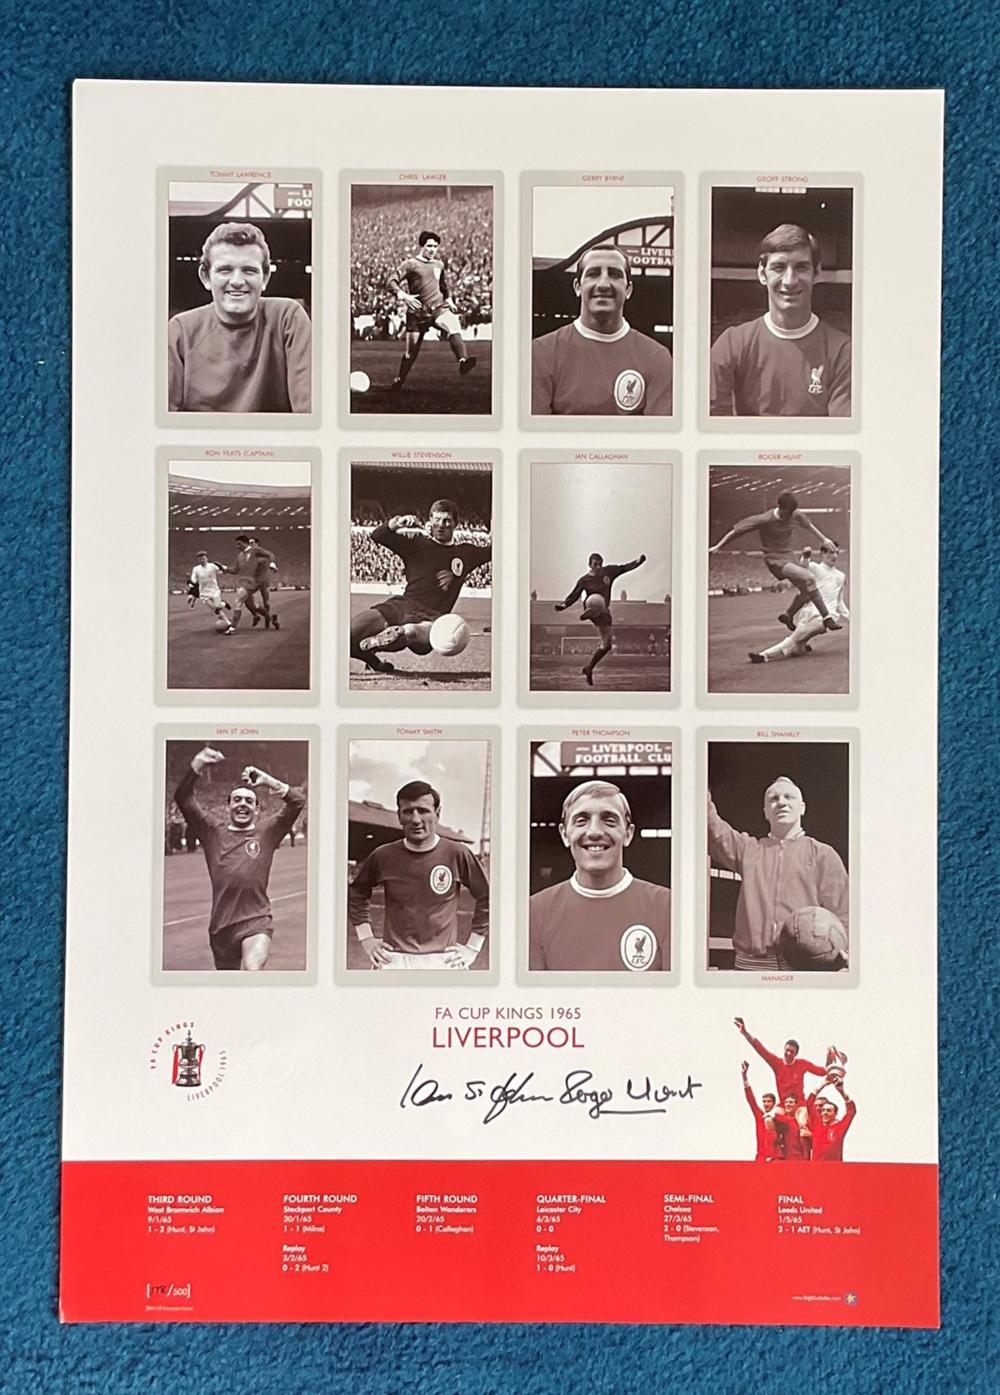 Ian St John and Roger Hunt signed 22x16 FA Cup Kings 1965 Liverpool Big Blue Tube print. Good